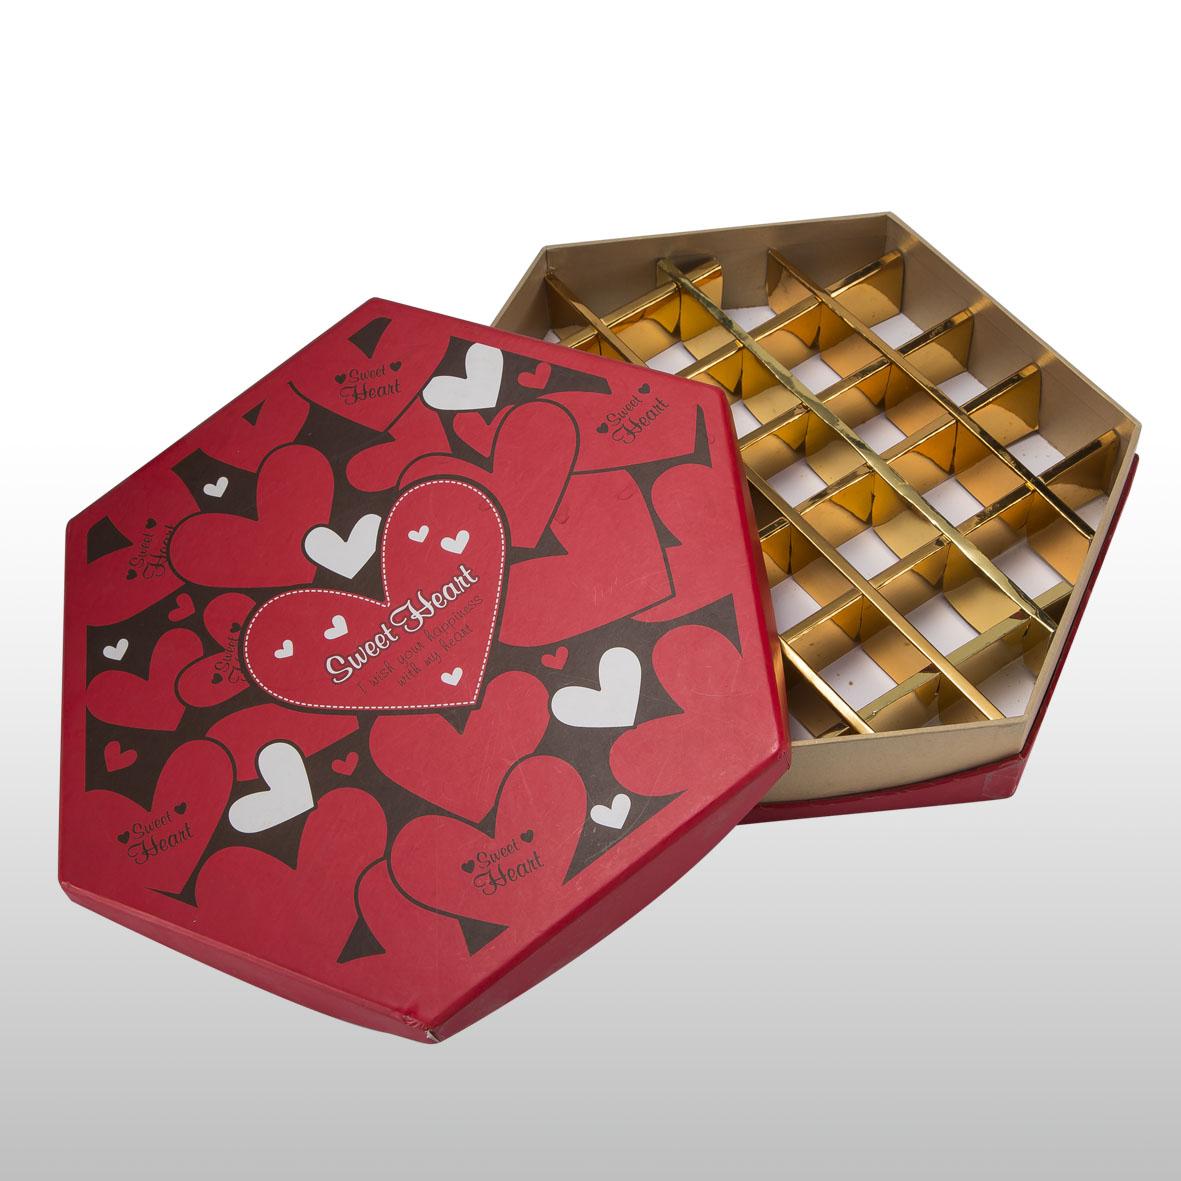 Customized Candy Cake Chocolate Jewelry Cosmetic Perfume Jewellery Cardboard Packing Paper Box Gift